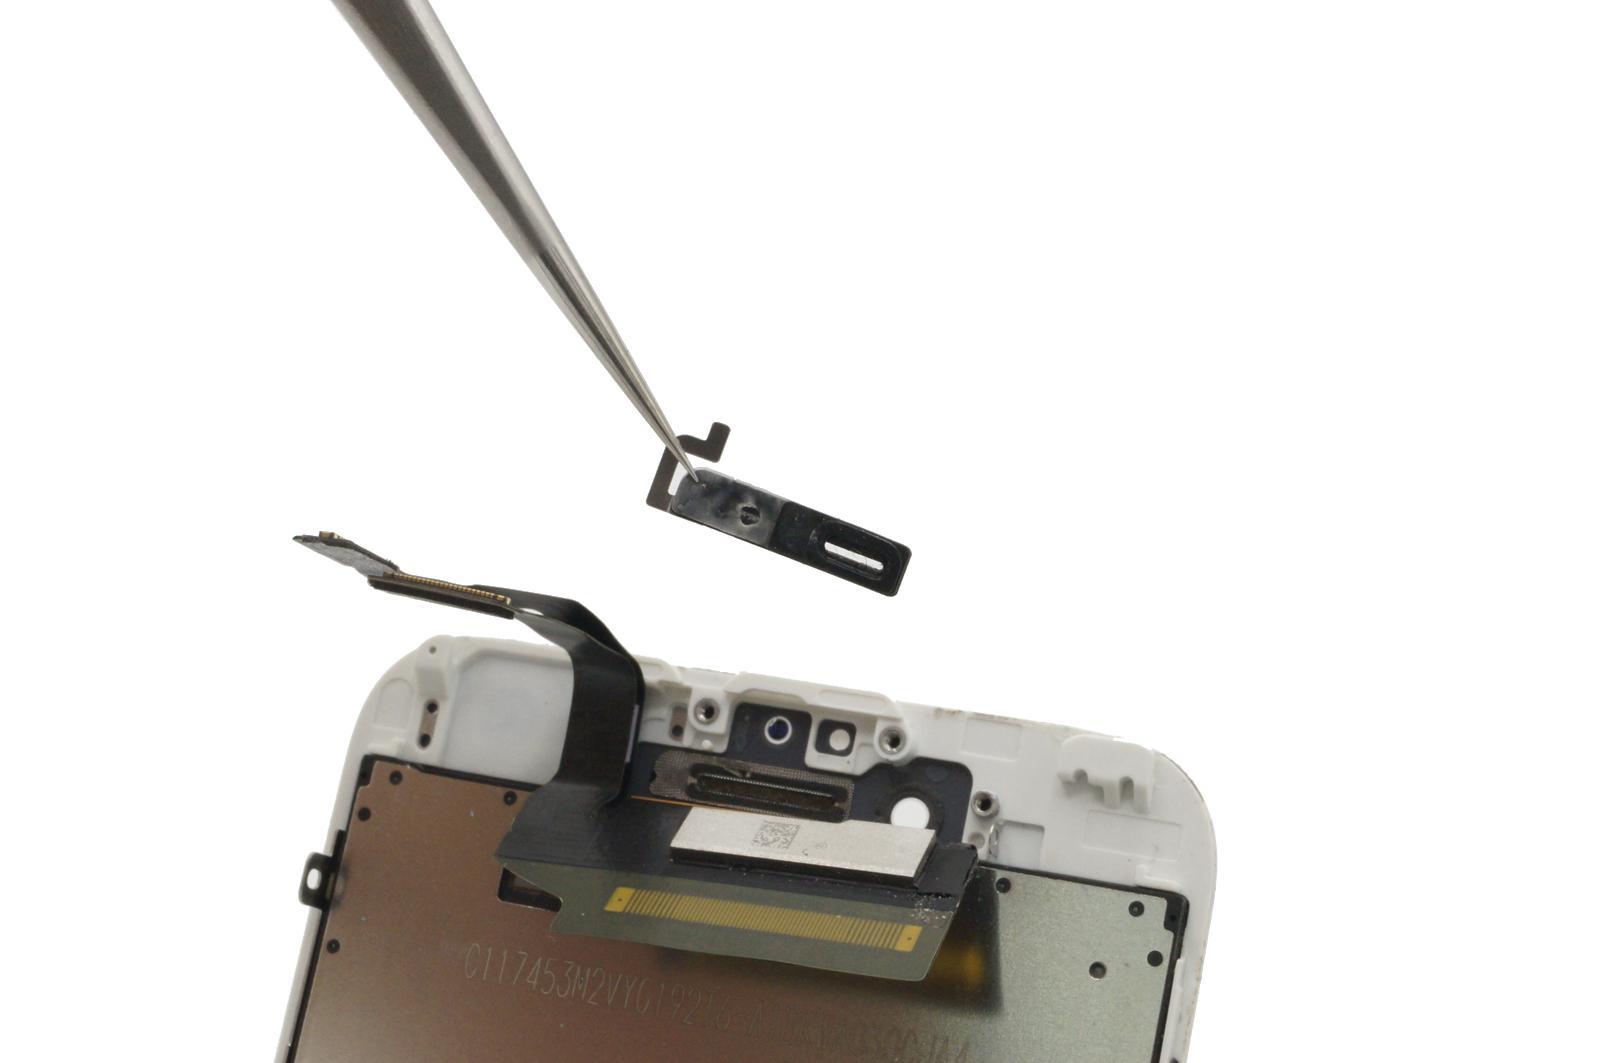 завершающий этап разбора разбитого экрана iPhone 6S